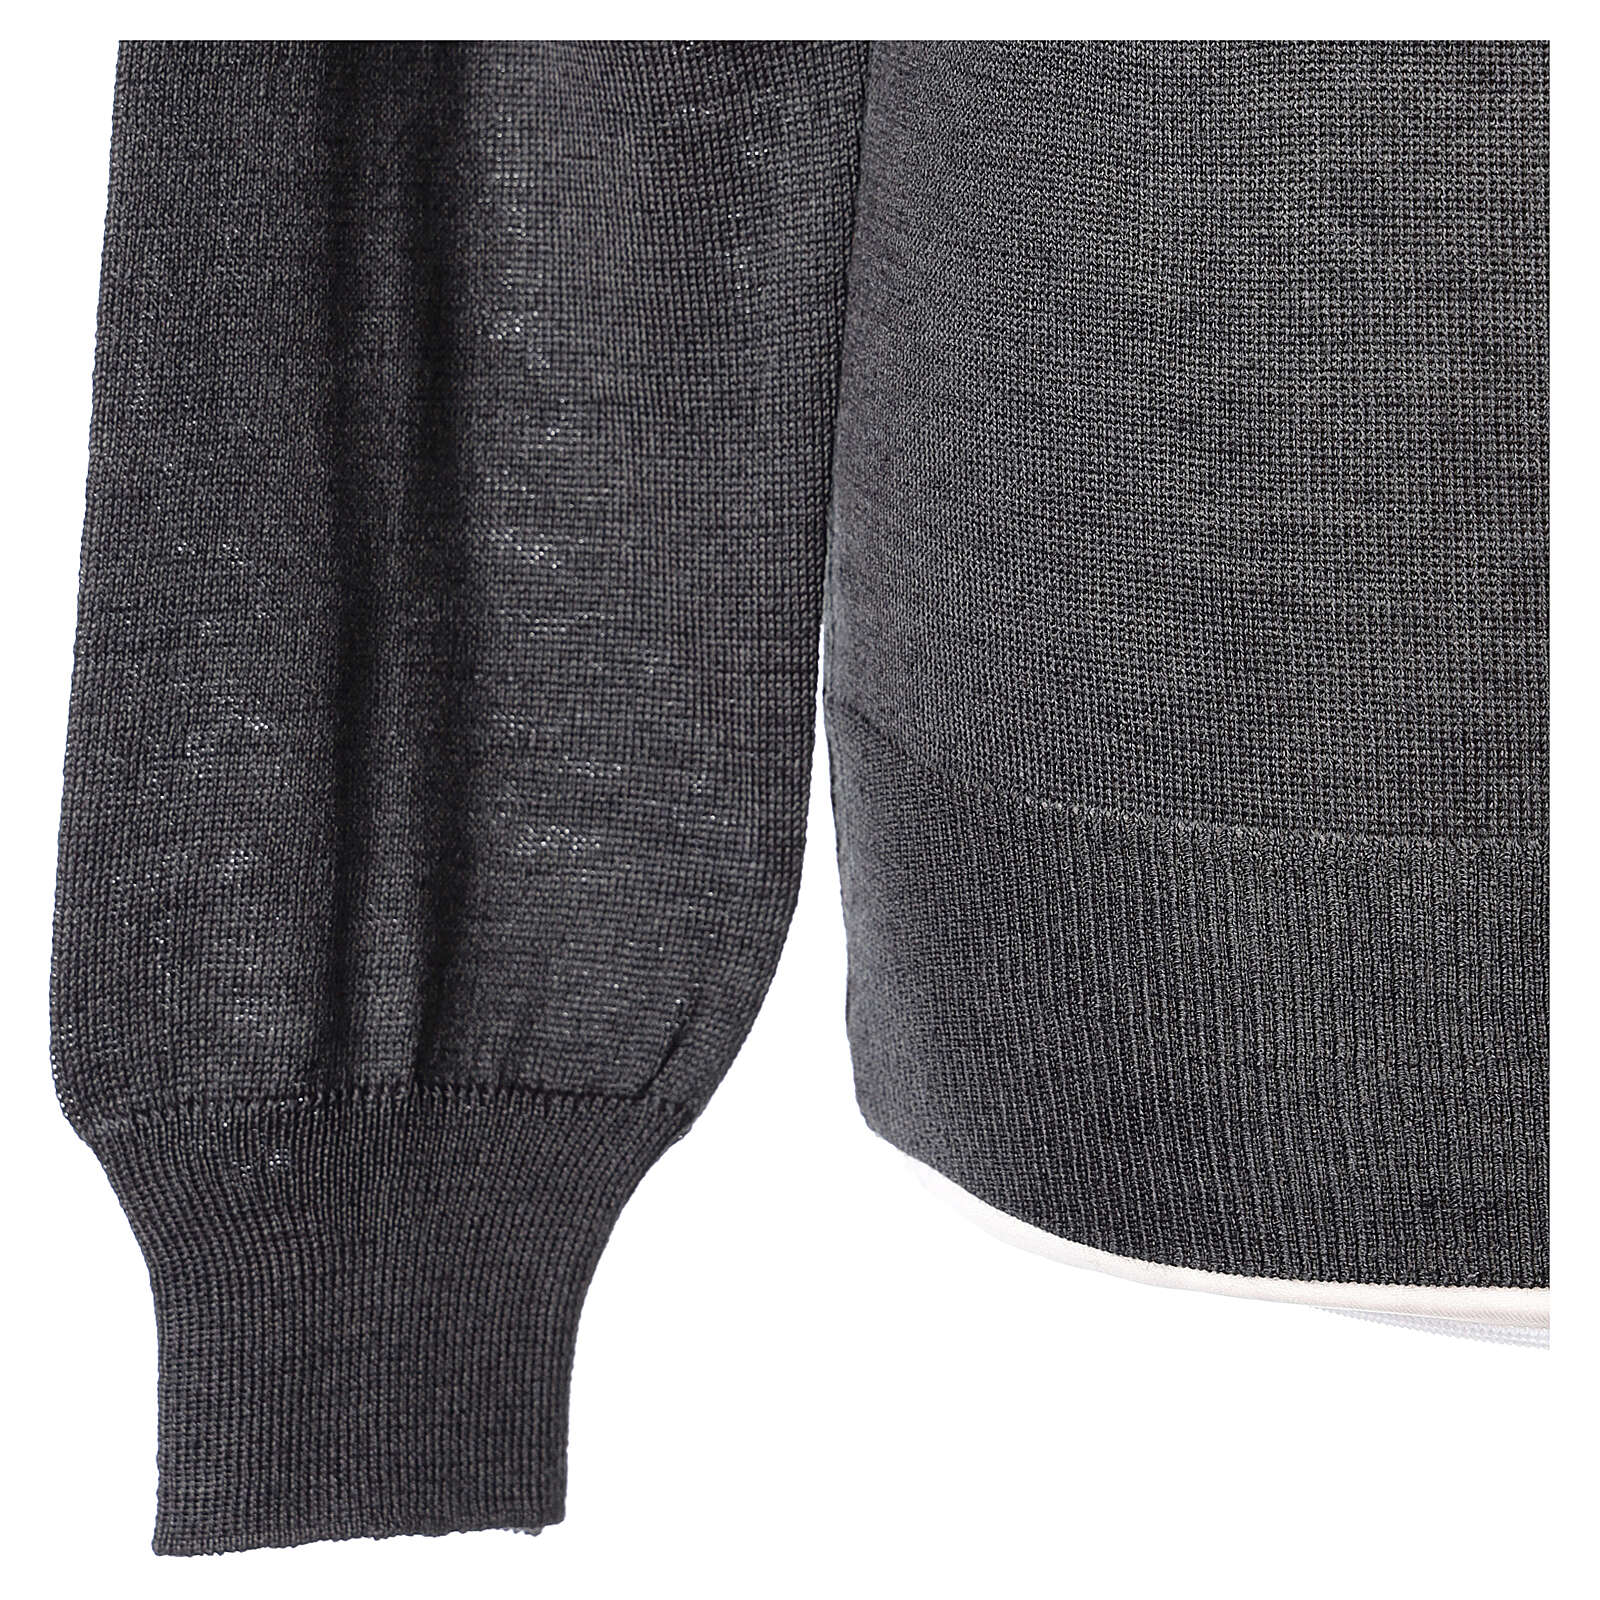 Pulôver sacerdote antracite gola redonda tricô plano 50% lã de merino 50% acrílico In Primis 4